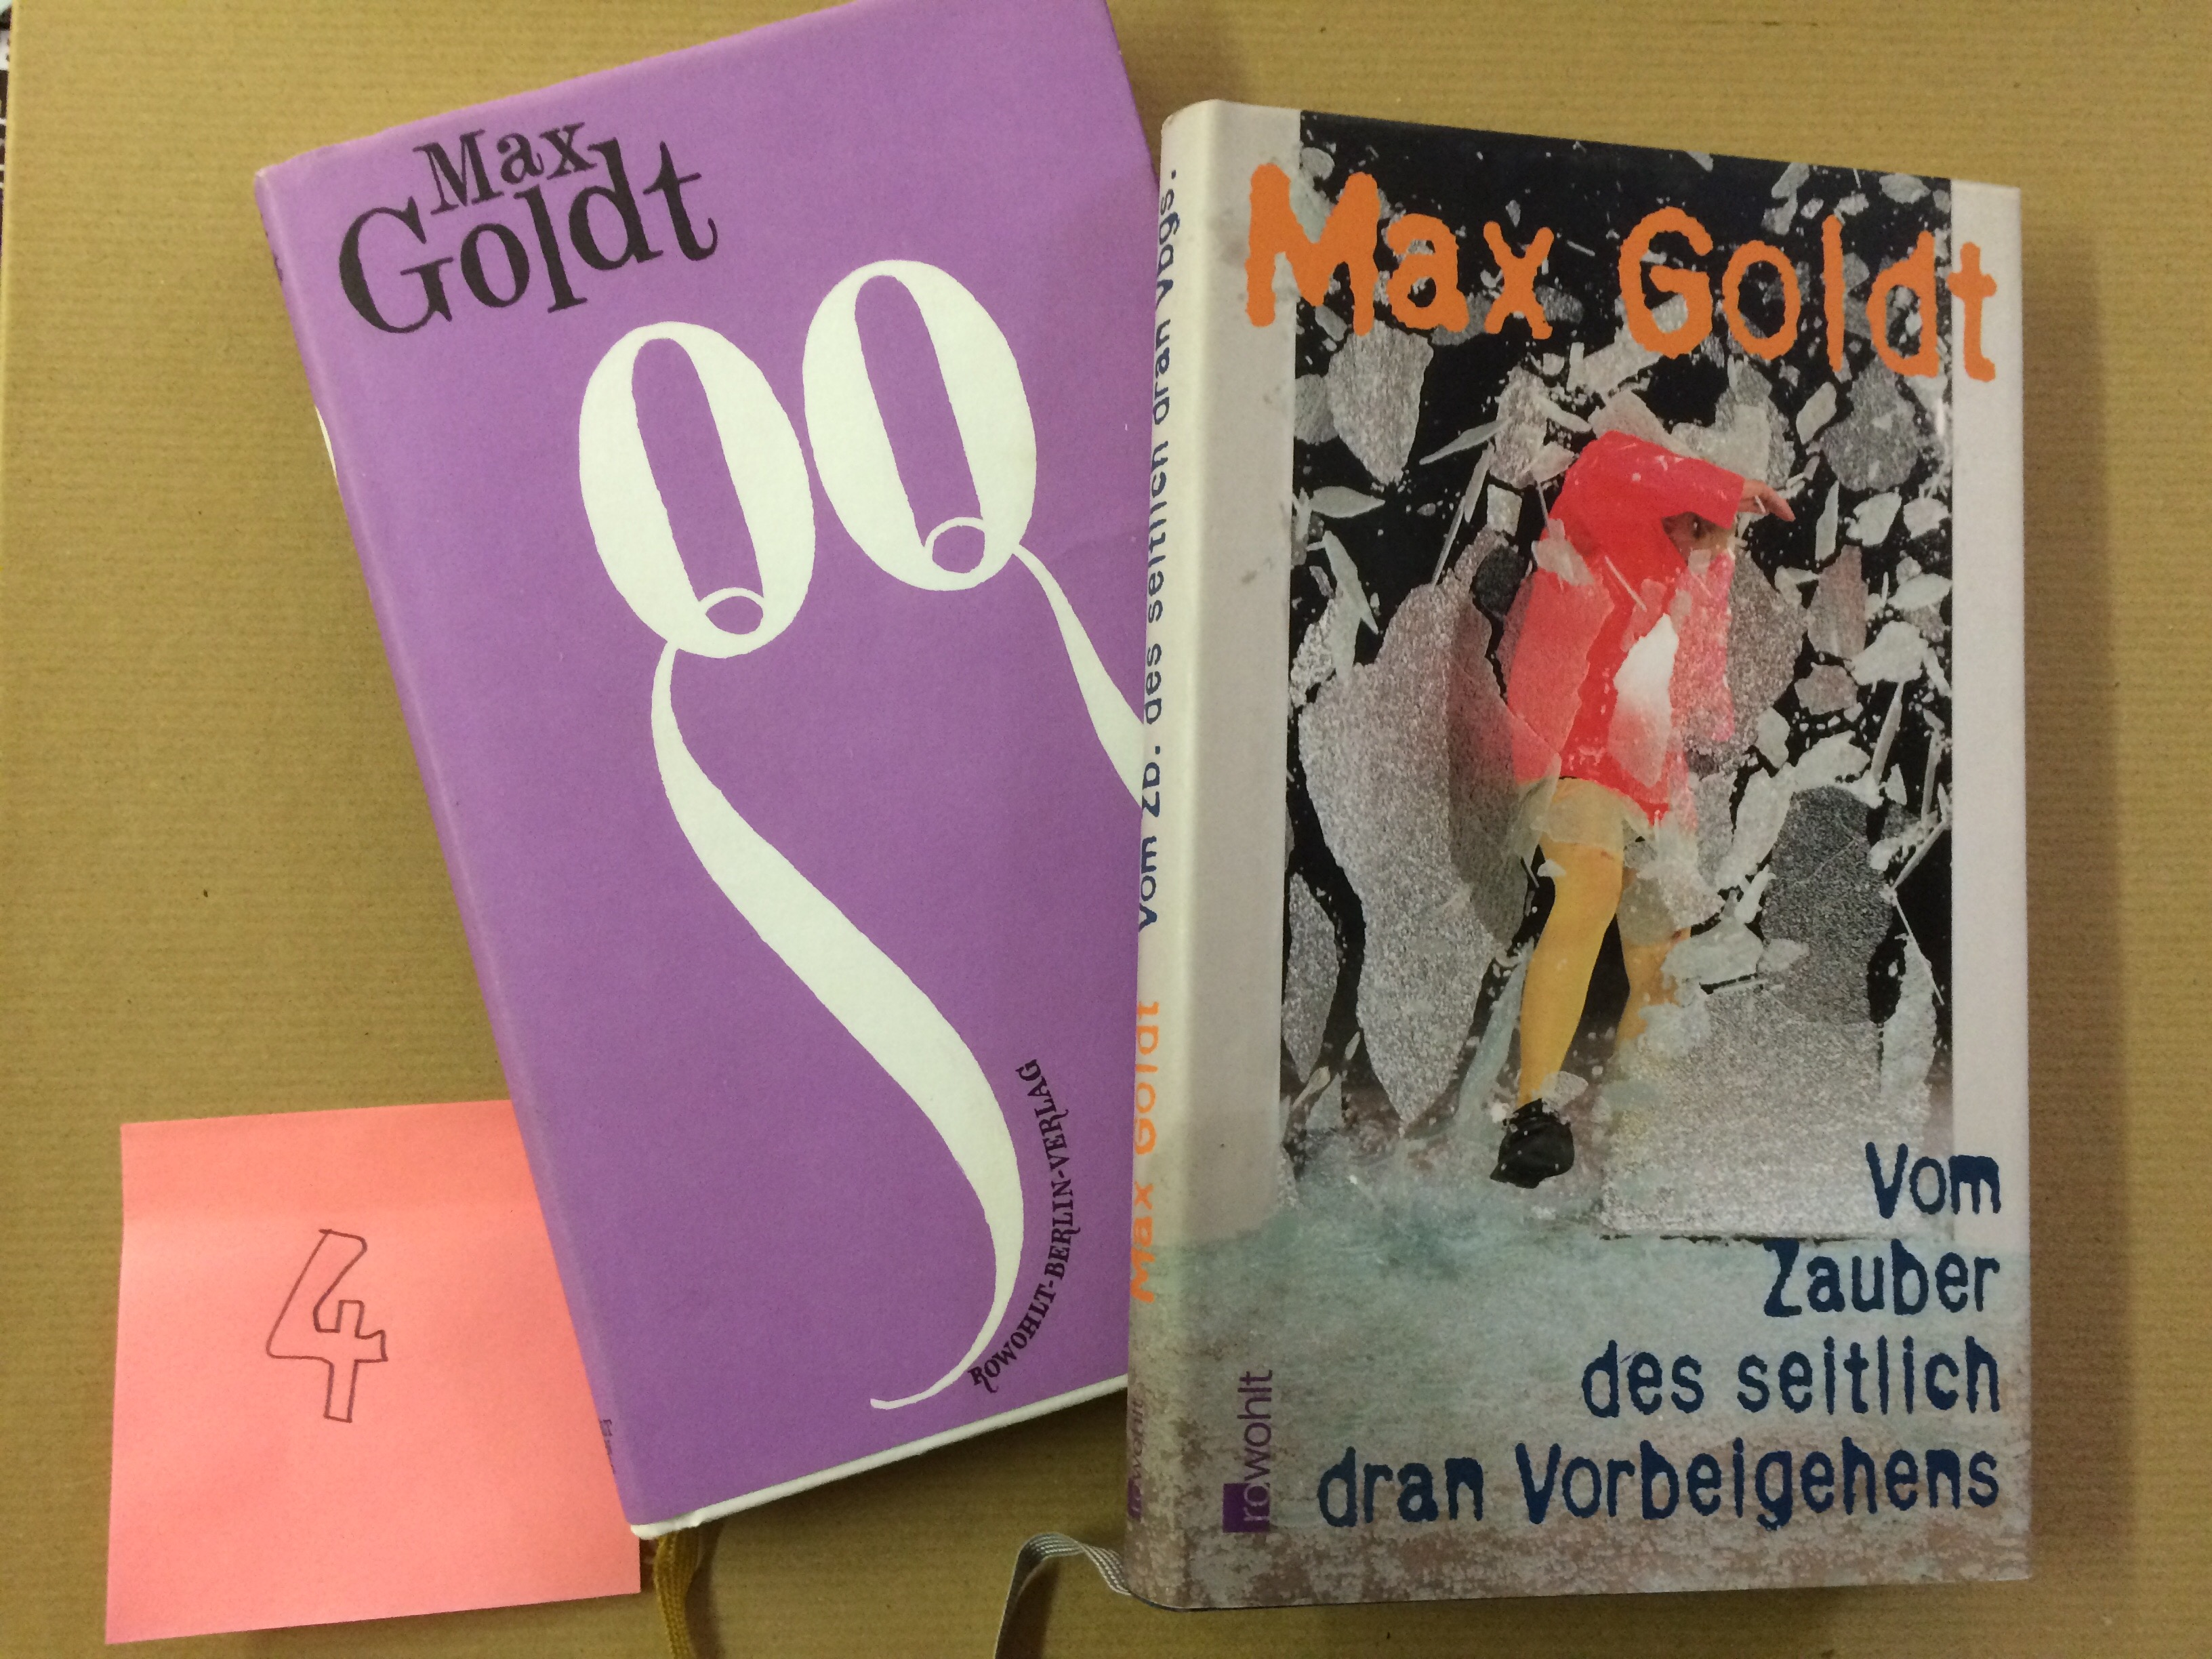 04-max-goldt-qq-vom-zauber